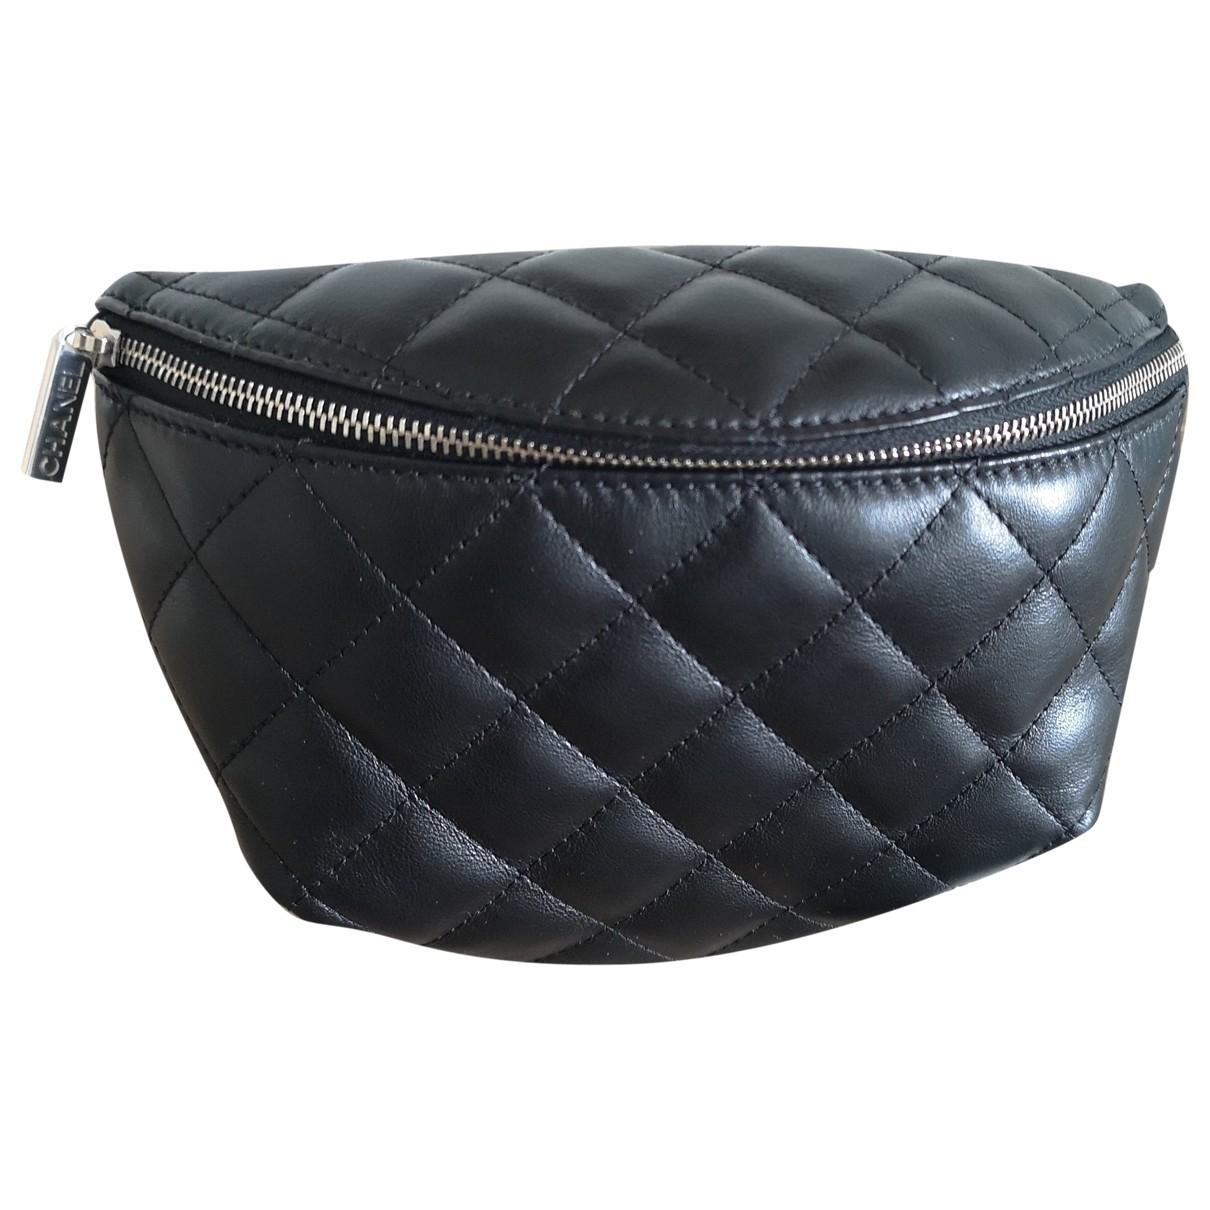 Chanel N Black Leather Clutch bag for Women N